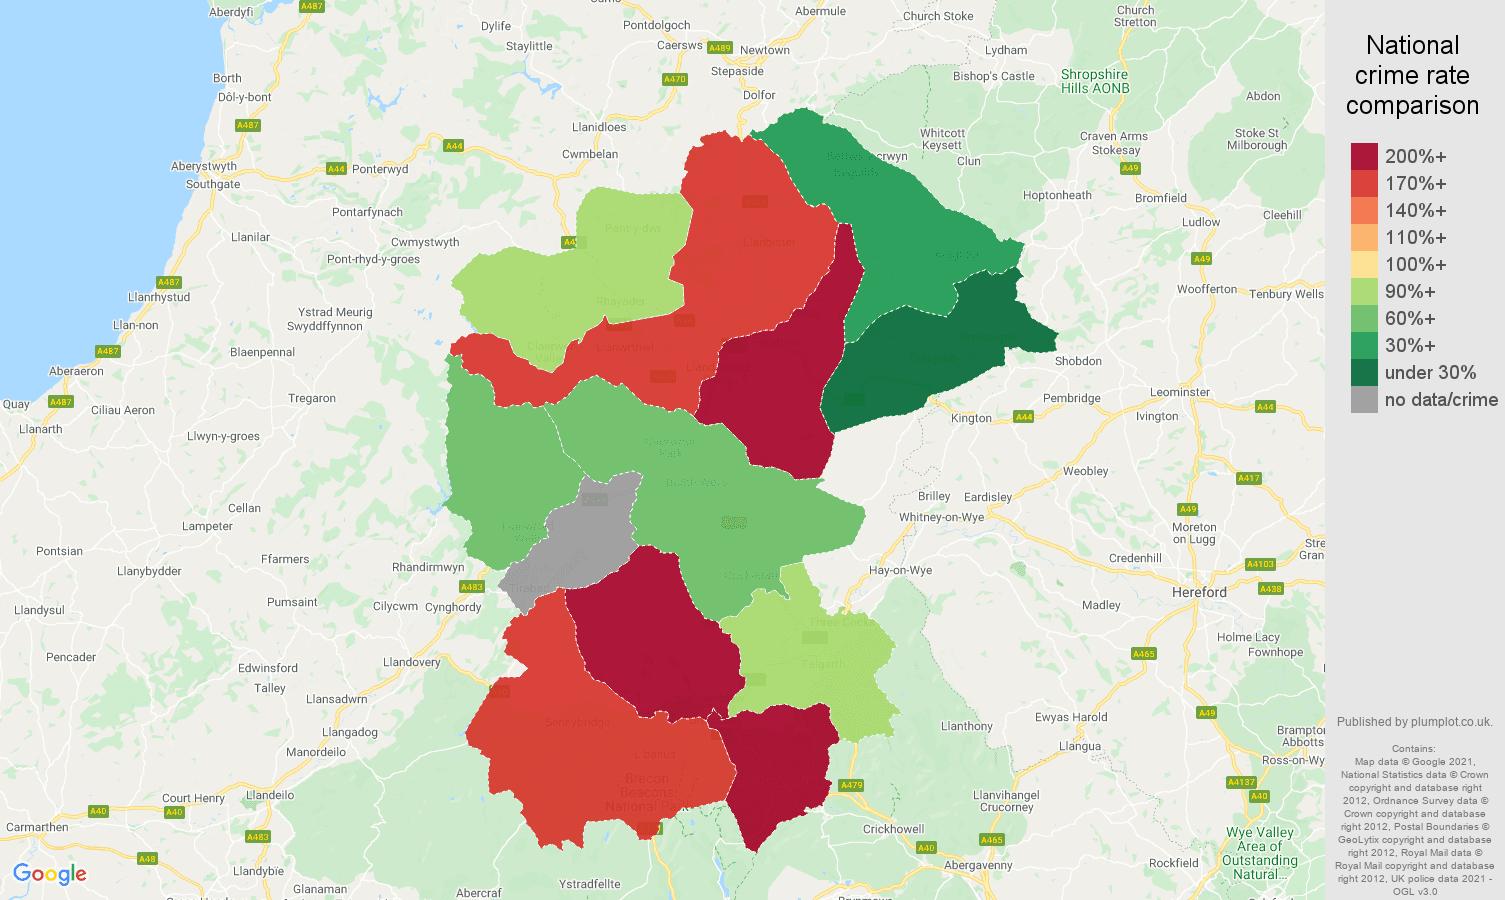 Llandrindod Wells drugs crime rate comparison map